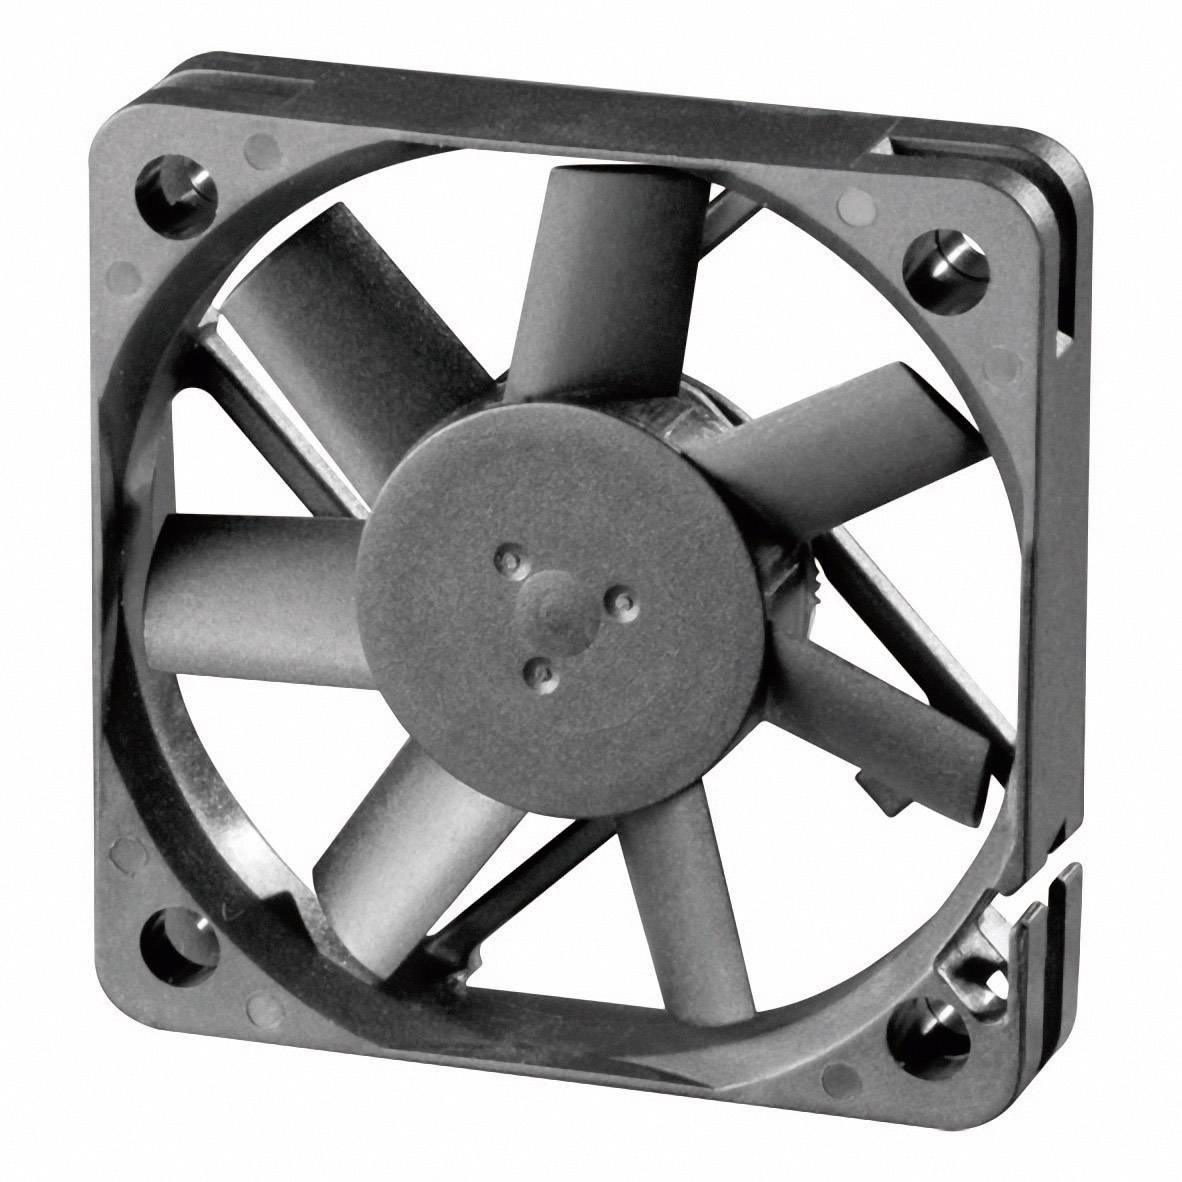 Axiálny ventilátor Sunon MB50100V2-0000-A99 MB50100V2-0000-A99, 5 V/DC, 26 dB, (d x š x v) 50 x 50 x 10 mm